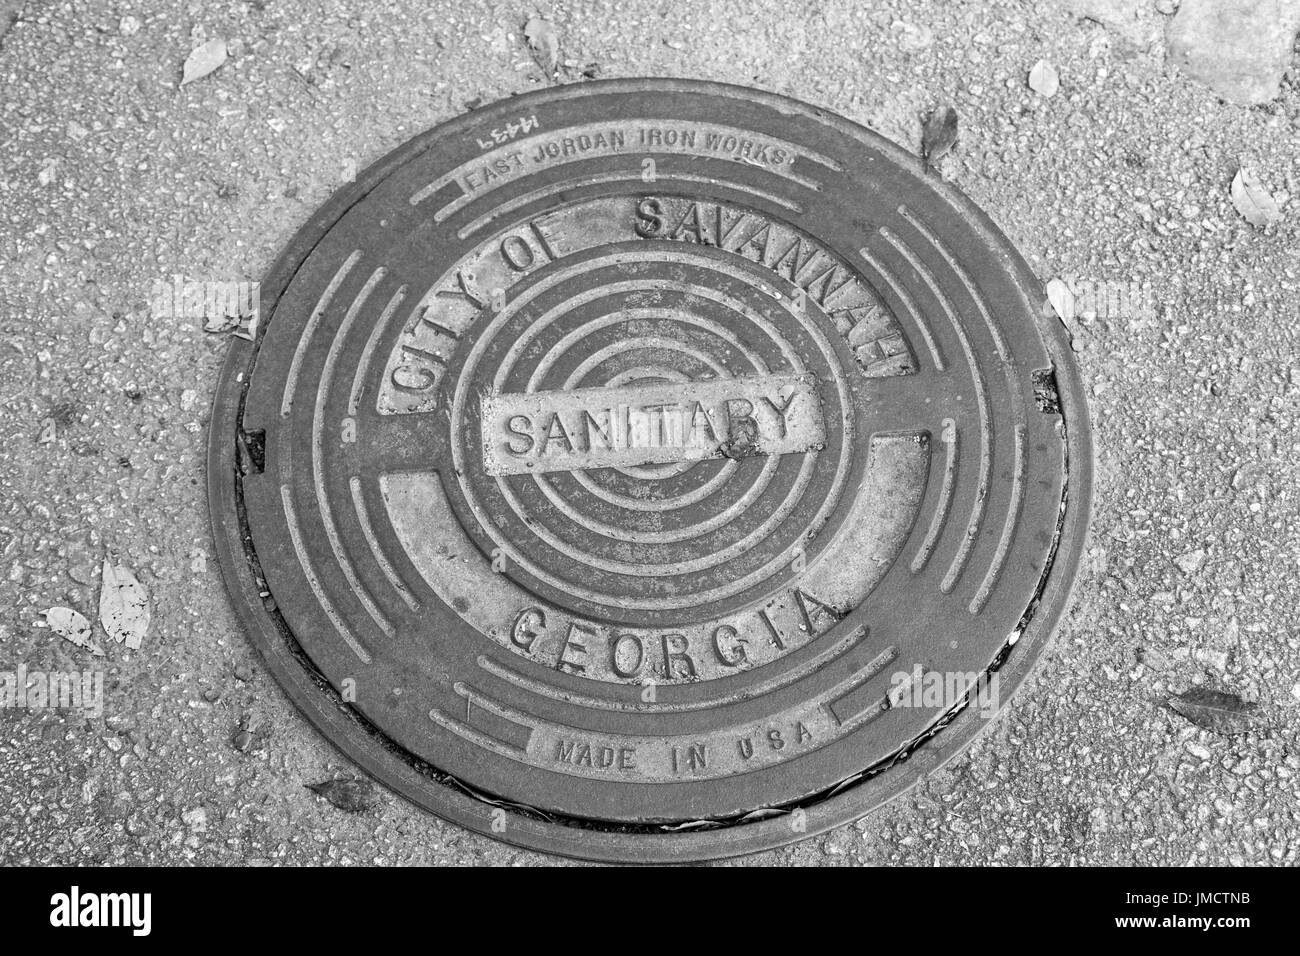 Savannah GA manhole cover - Stock Image